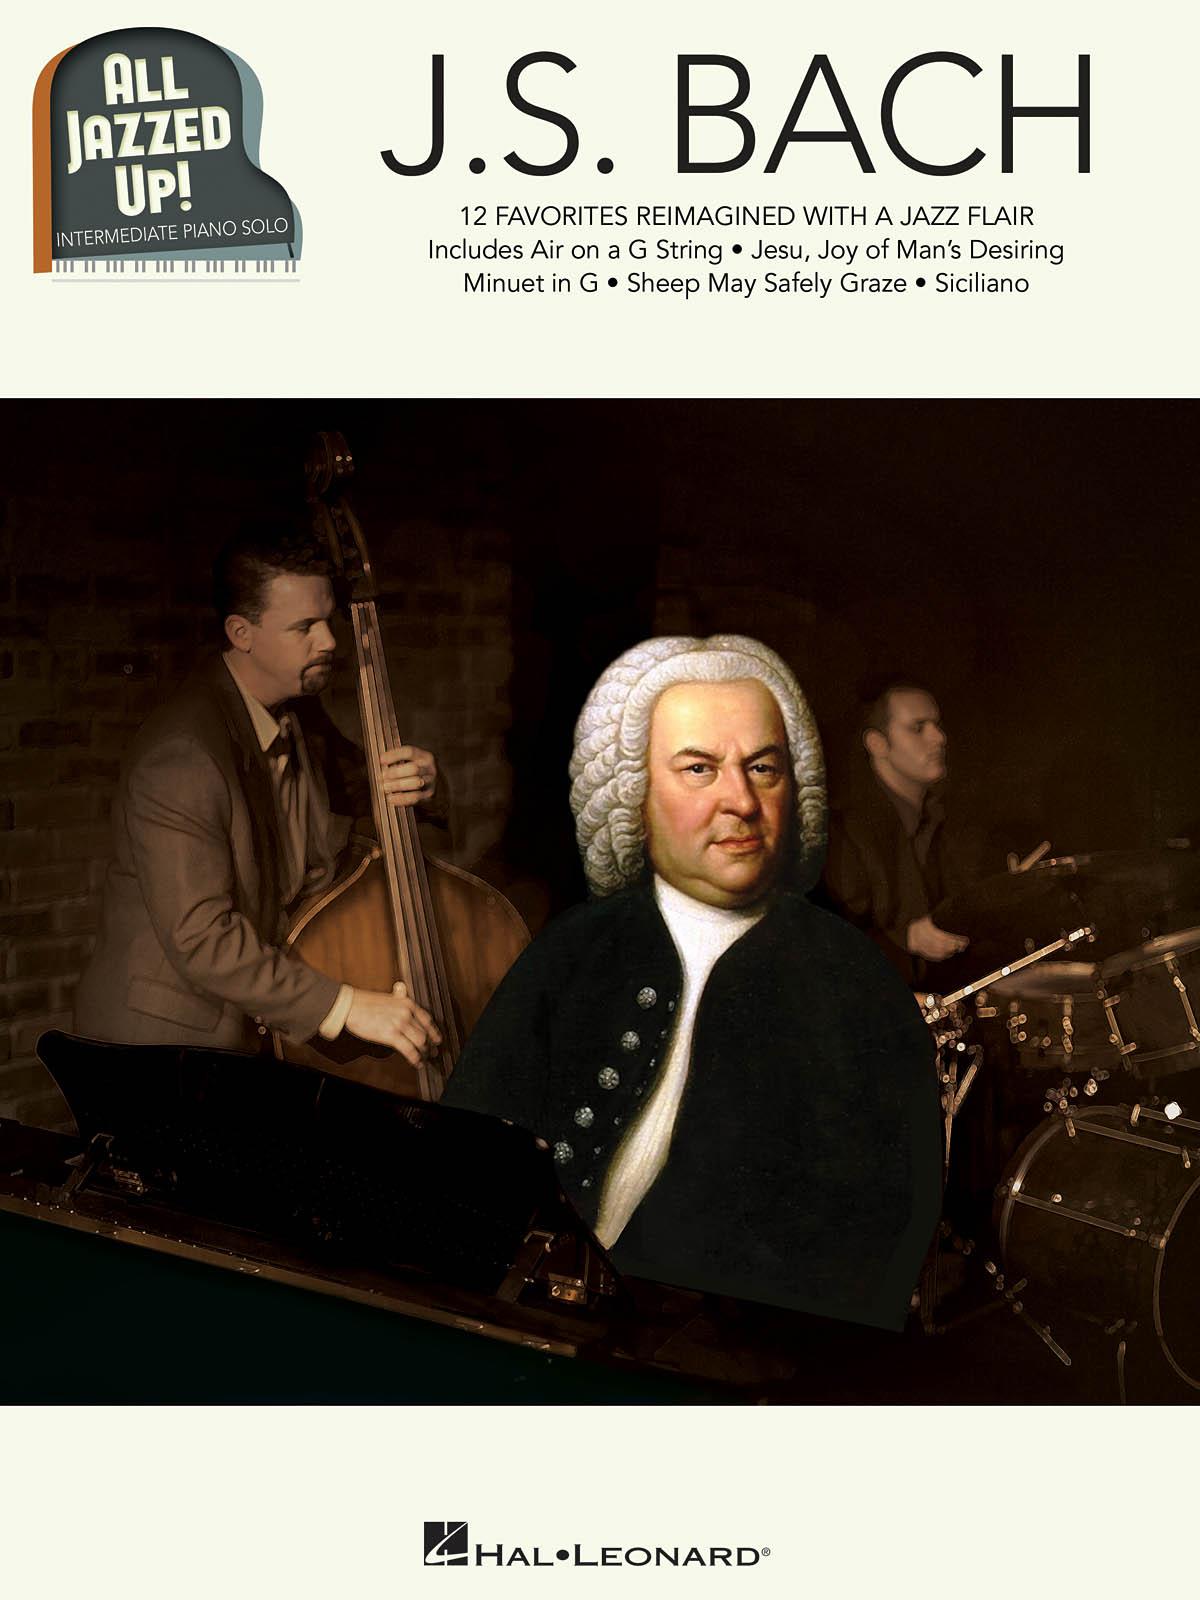 Johann Sebastian Bach: J.S. Bach - All Jazzed Up!: Piano: Instrumental Album